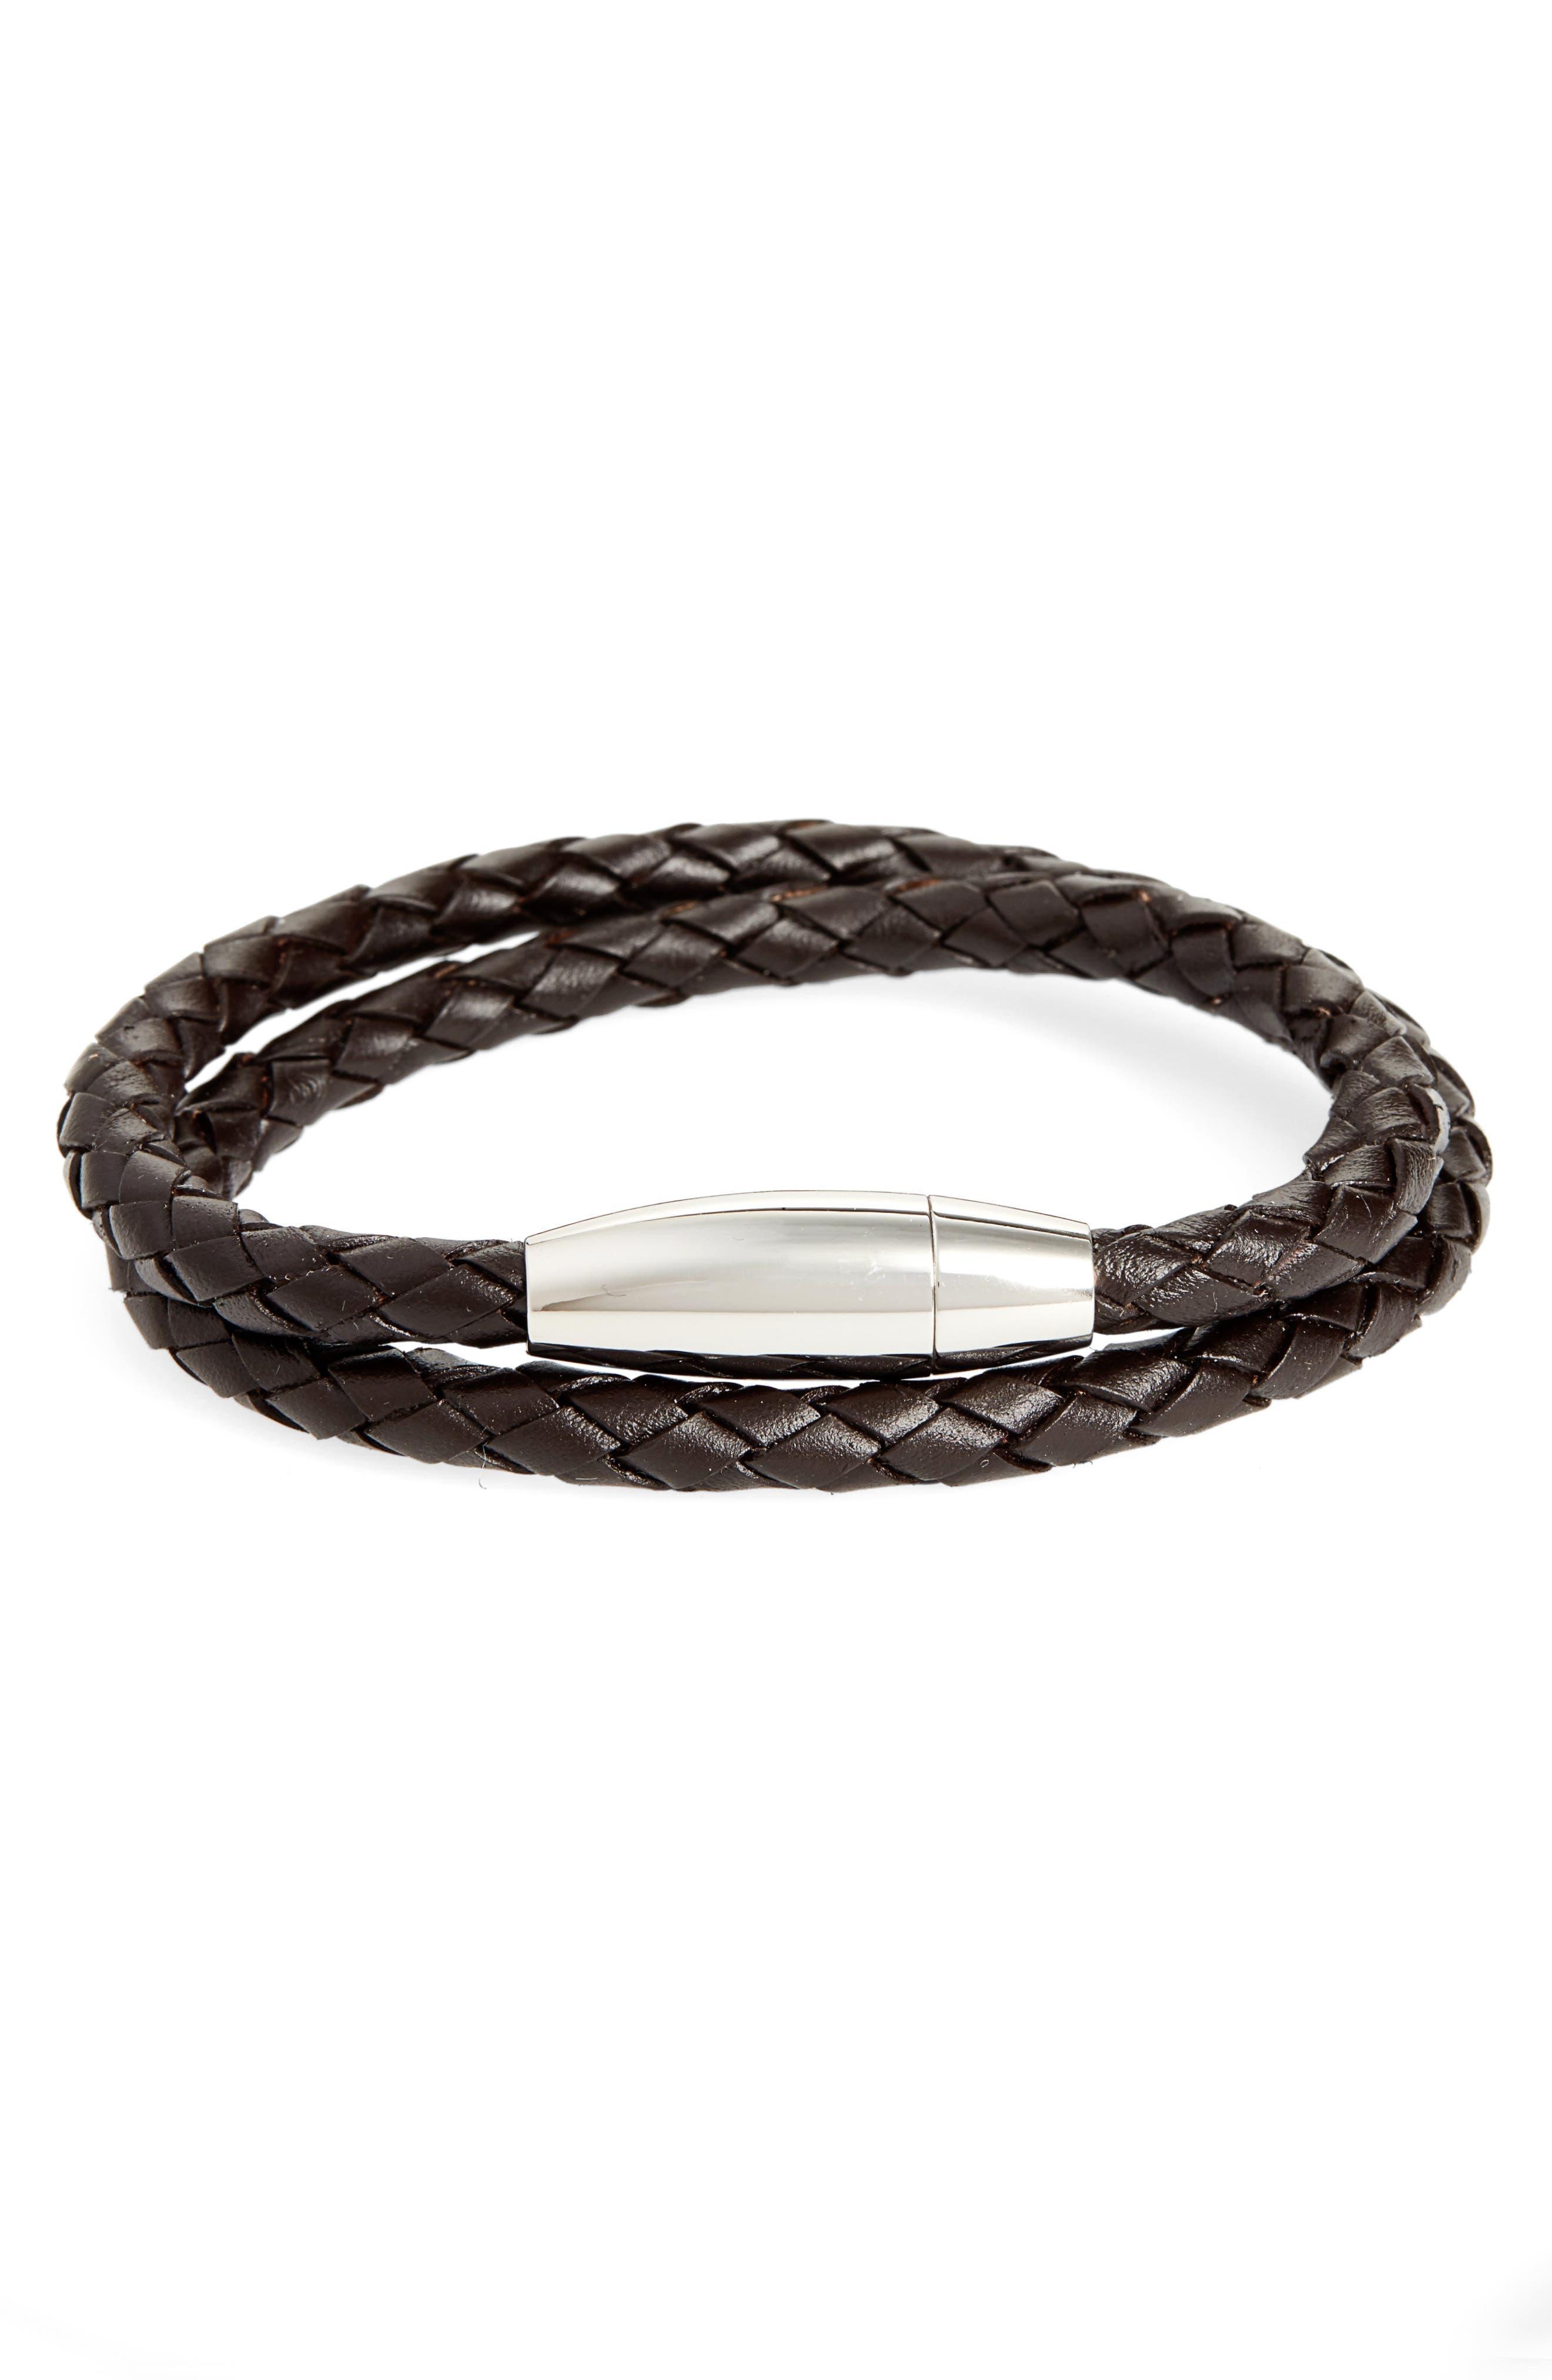 Braided Leather Wrap Bracelet,                             Main thumbnail 1, color,                             BROWN